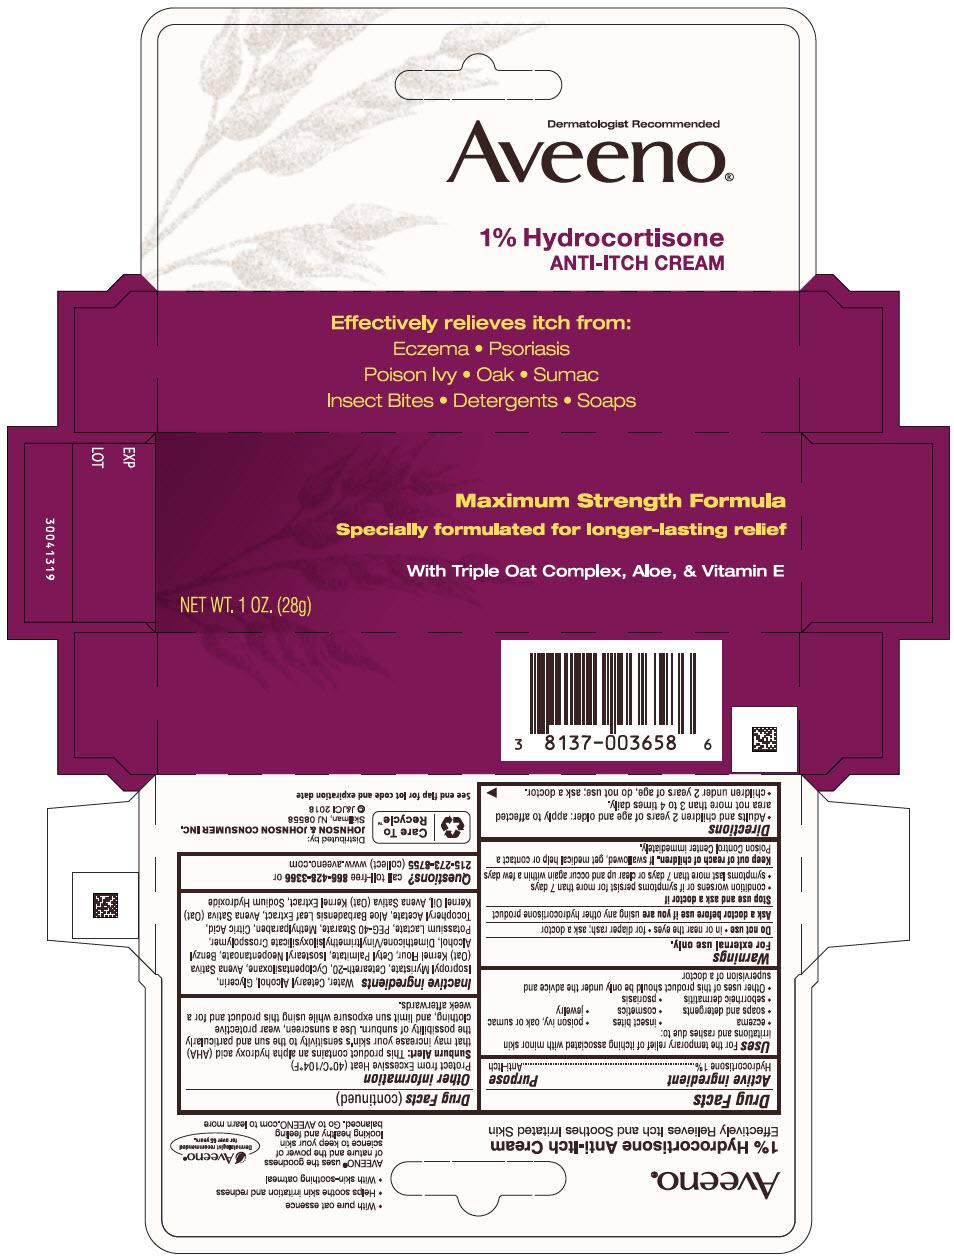 Hydrocortisone (Aveeno Hydrocortisone ANTI-ITCH)